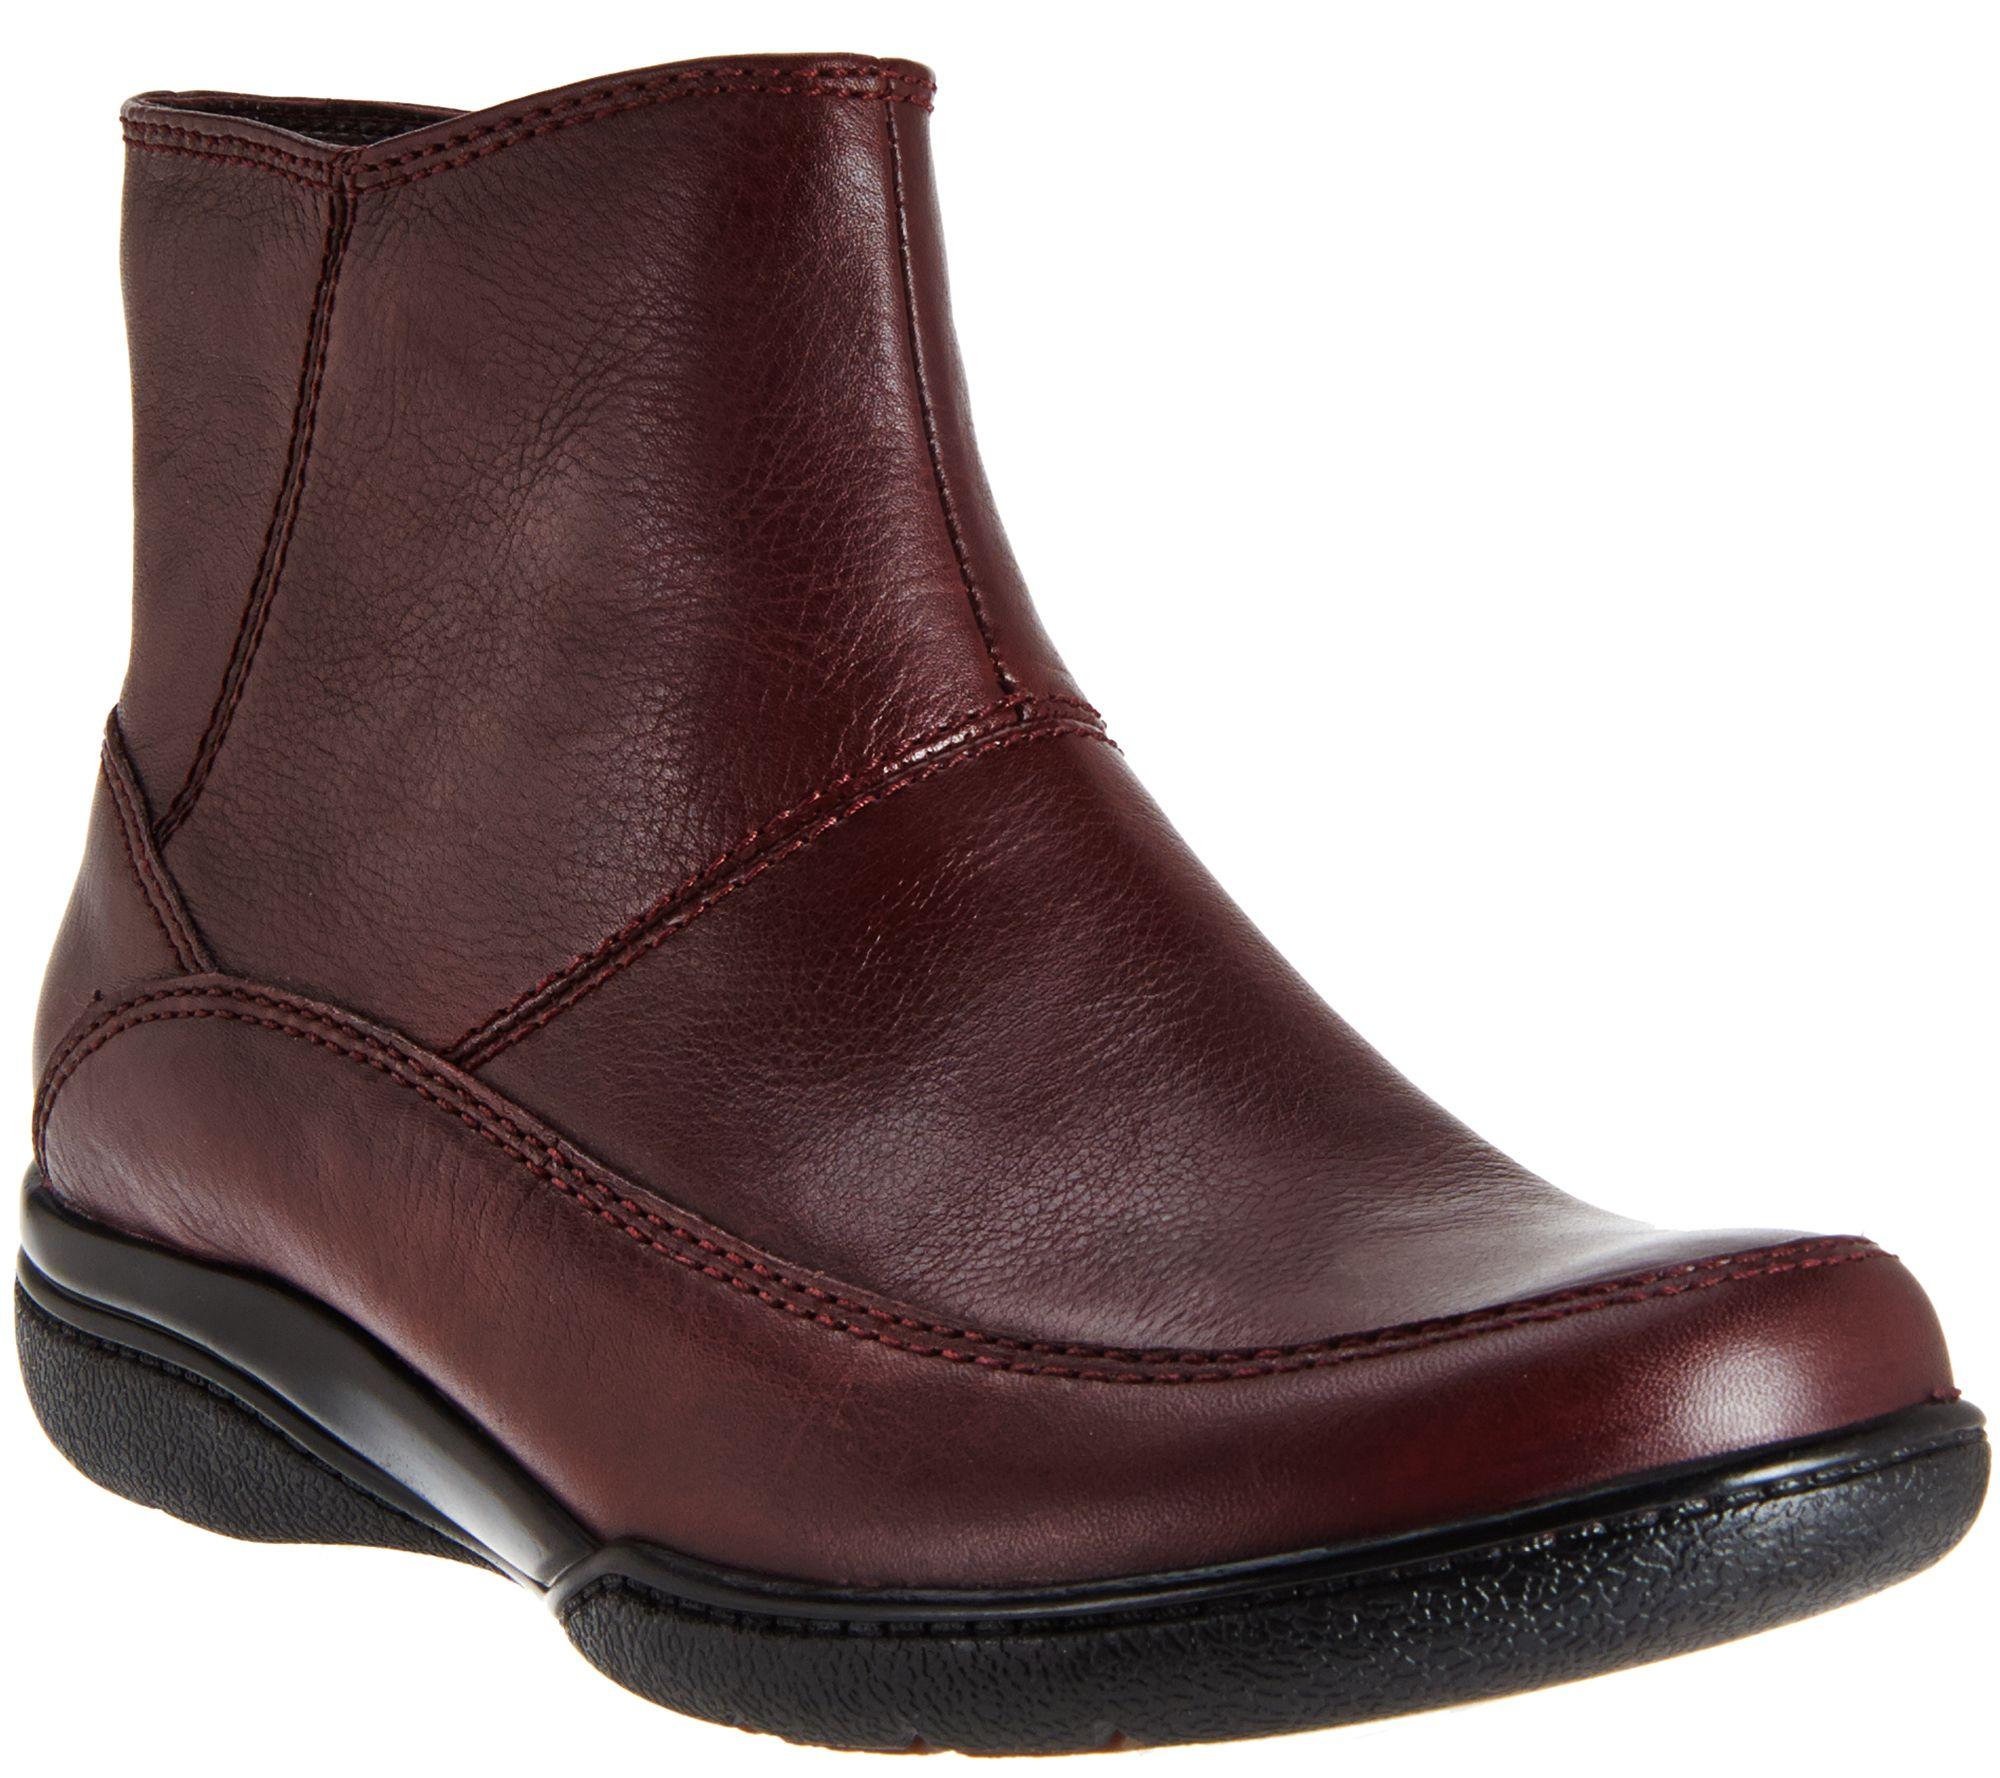 Clarks Kearns Flame Clarks- Black boots